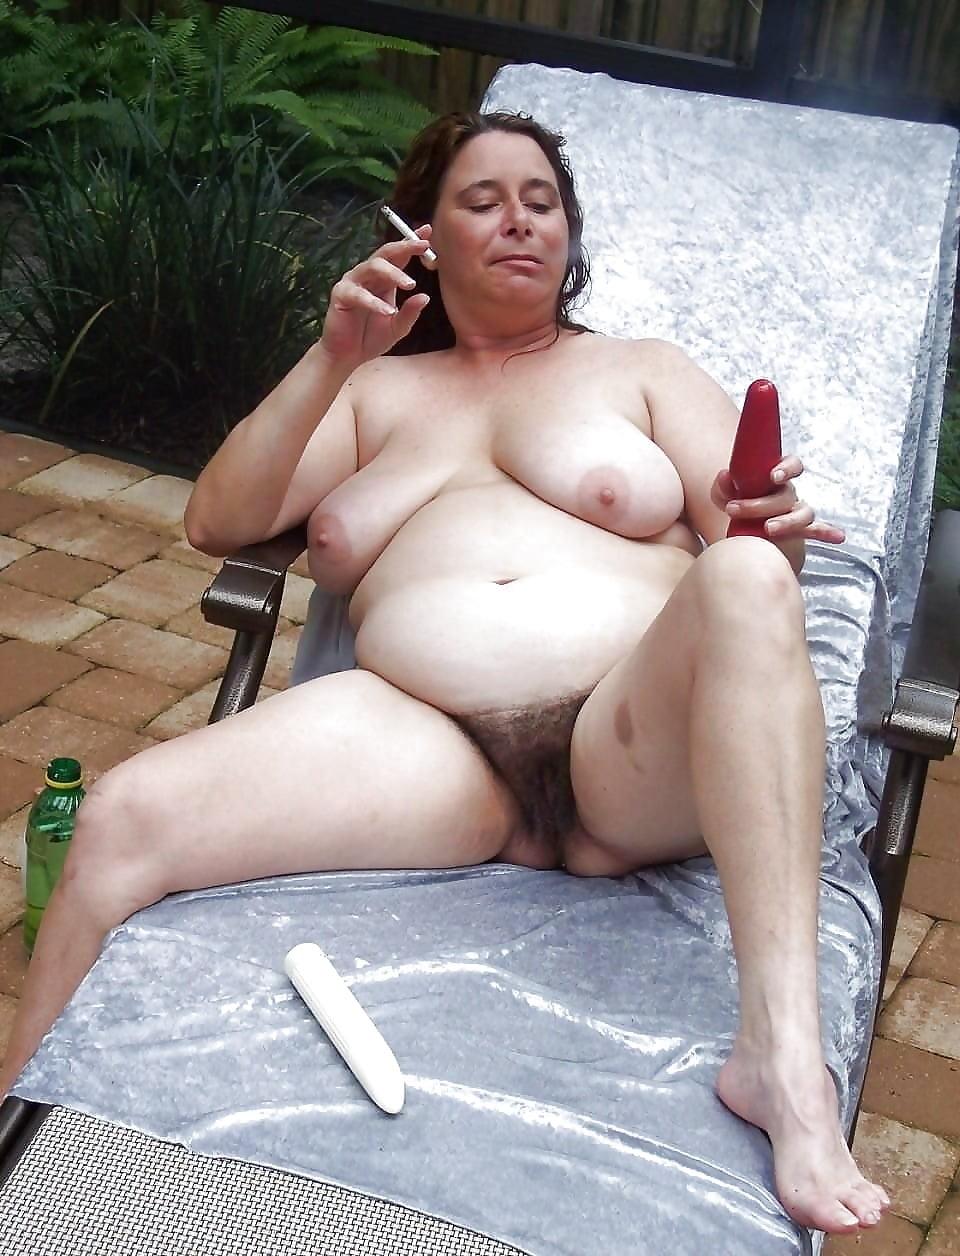 amateur-chubby-women-smoking-pot-egypt-penis